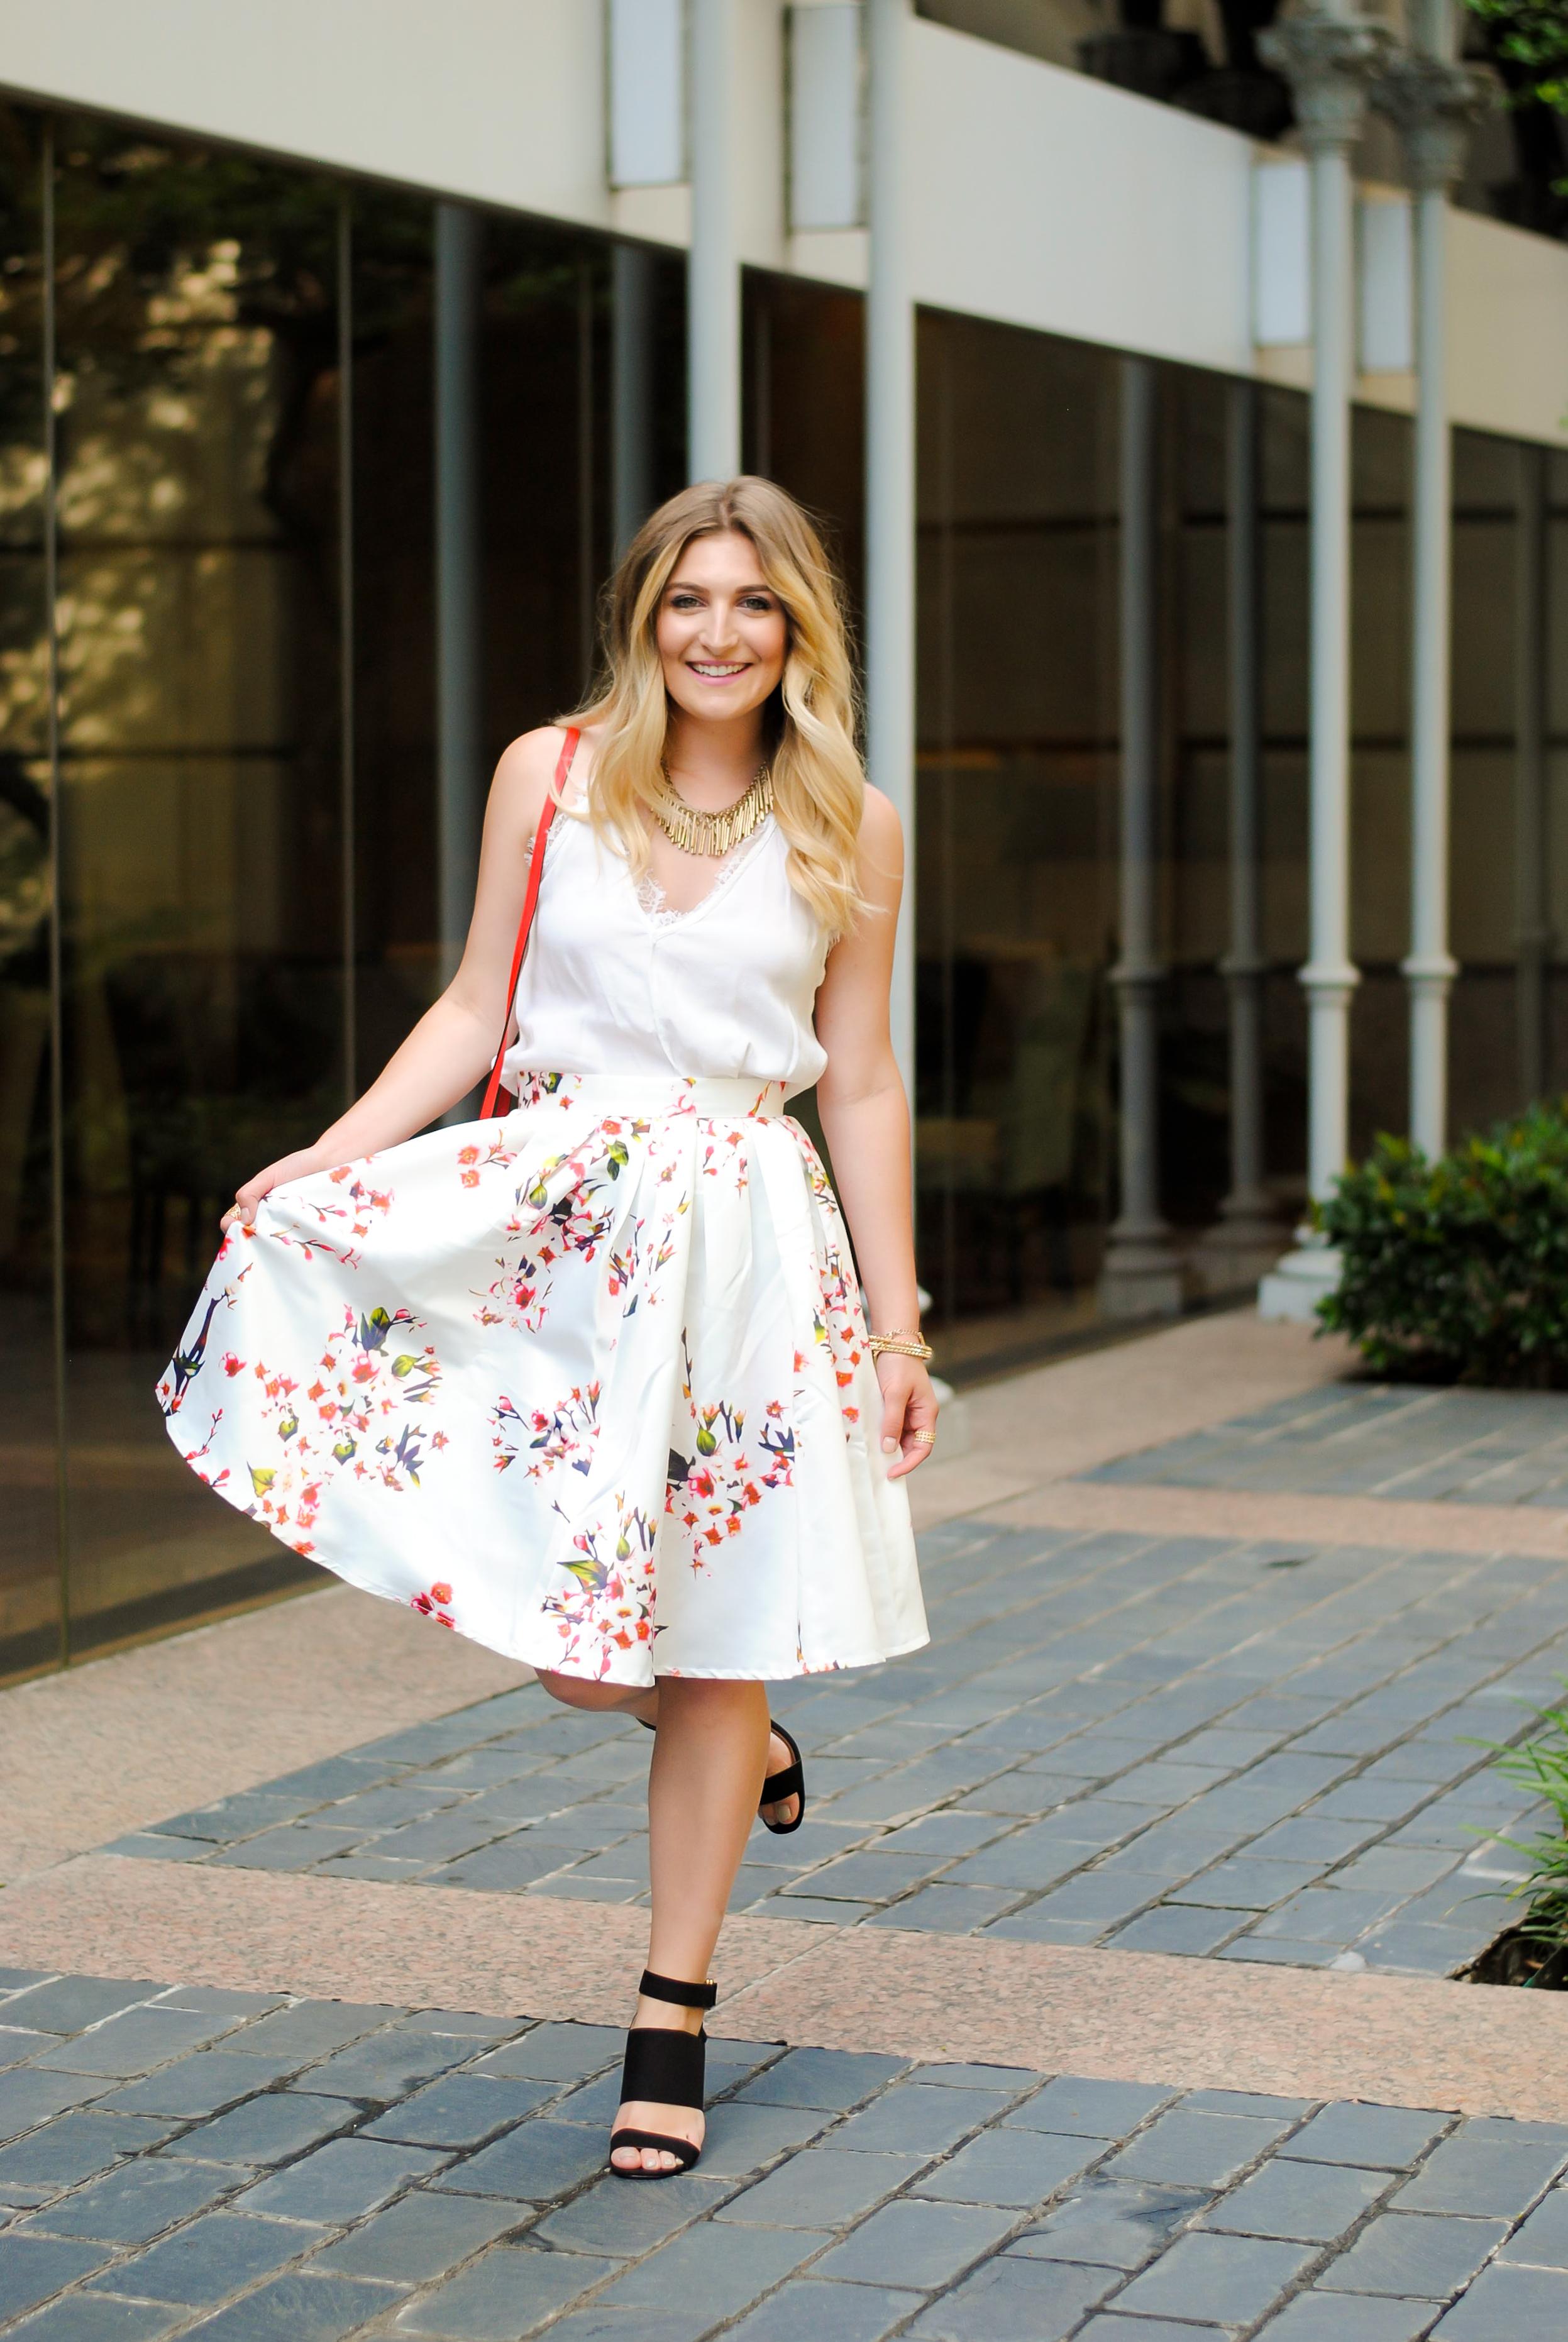 girly feminine look with SheIn | Audrey Madison Stowe Blog